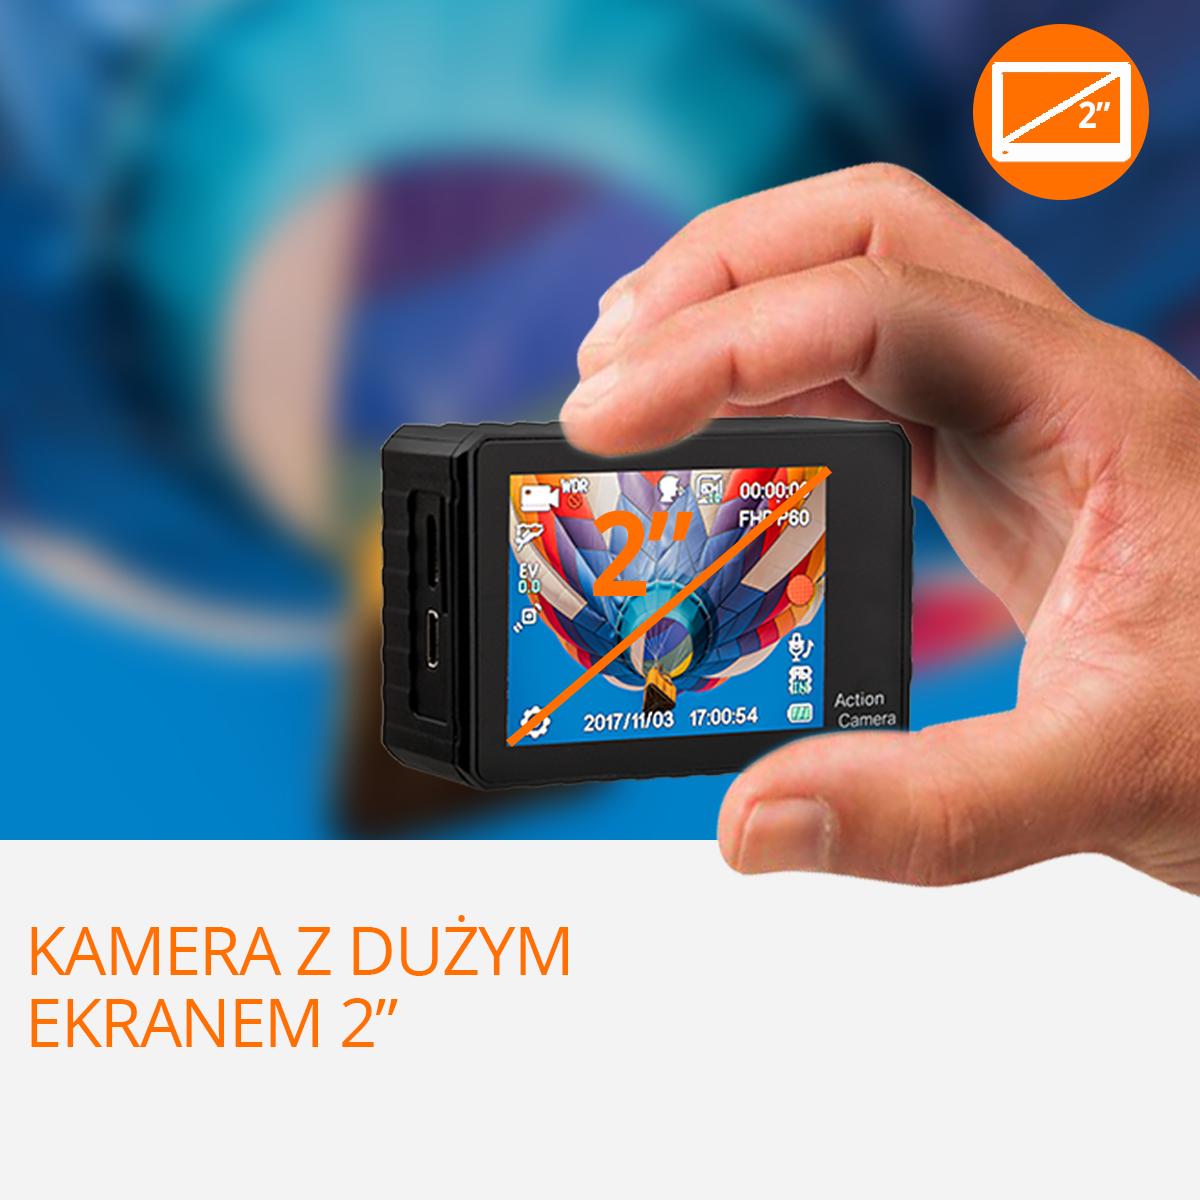 kamera sportowa xpro go 4k duzy ekran orllo.pl